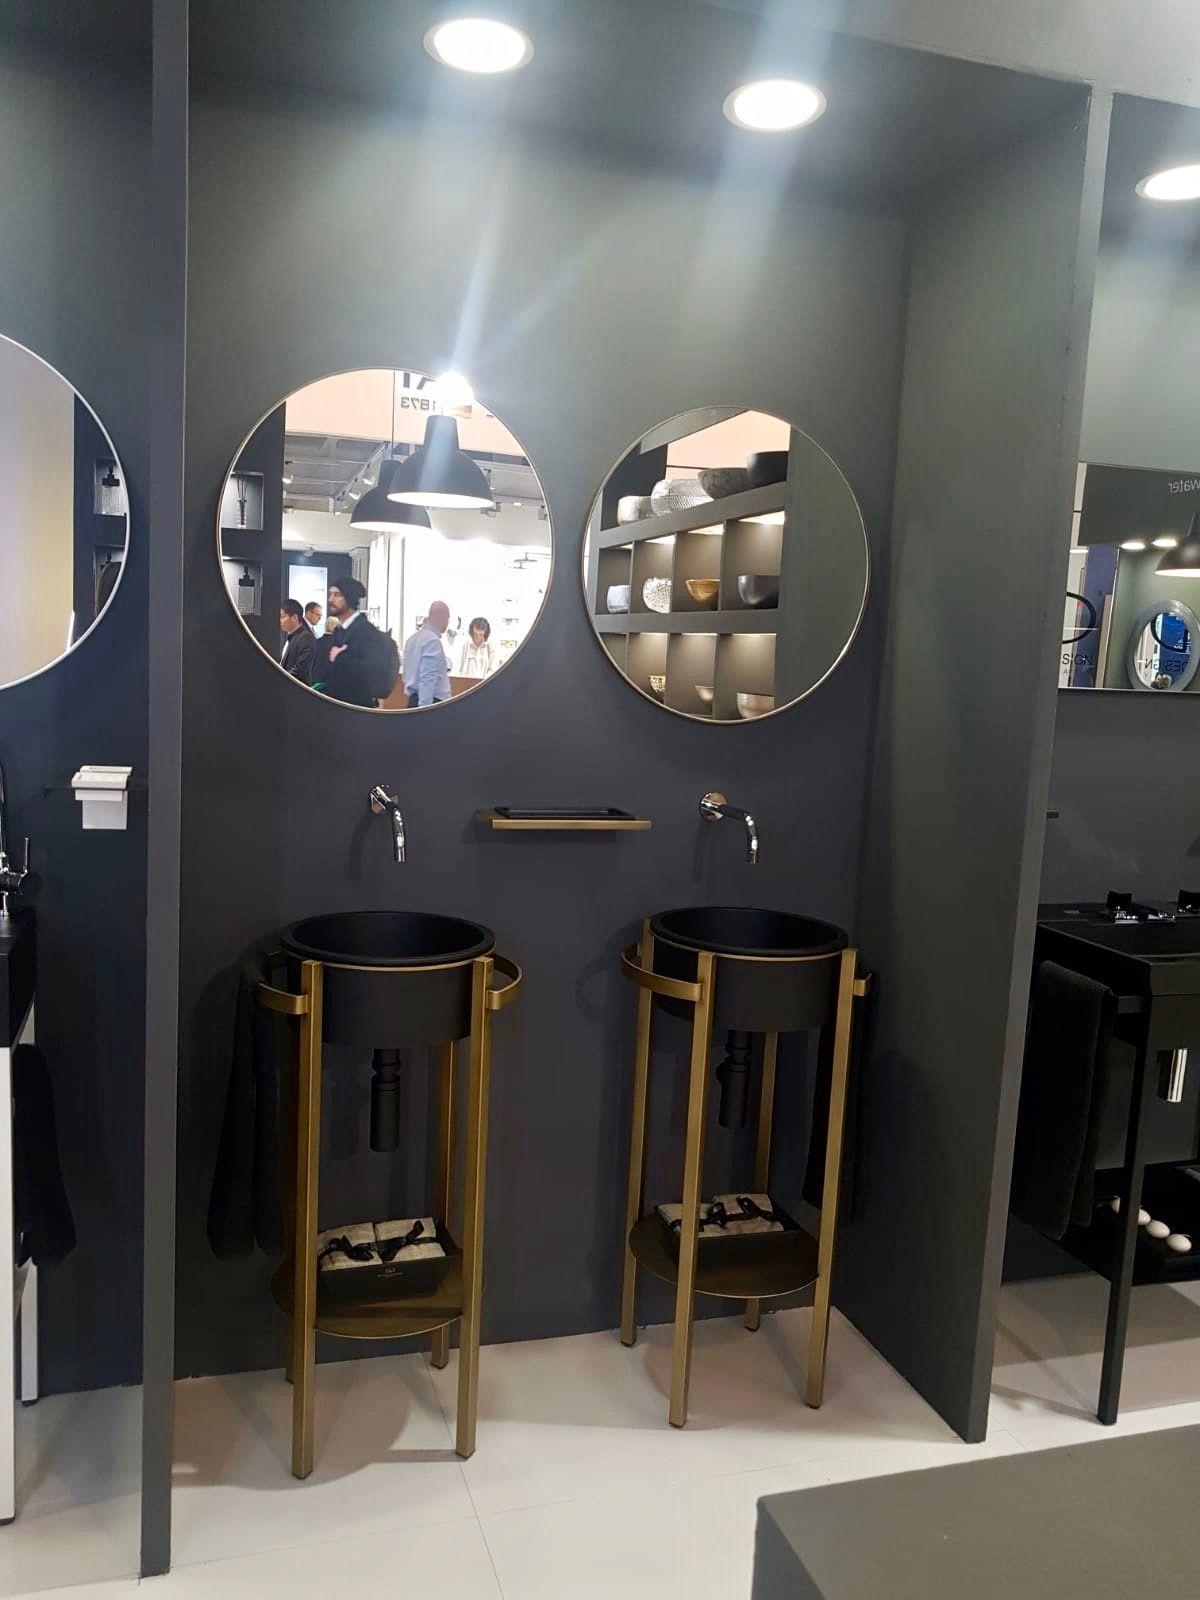 Lavabo TONDO PLUS Et Miroir METAL TONDO. Présentation